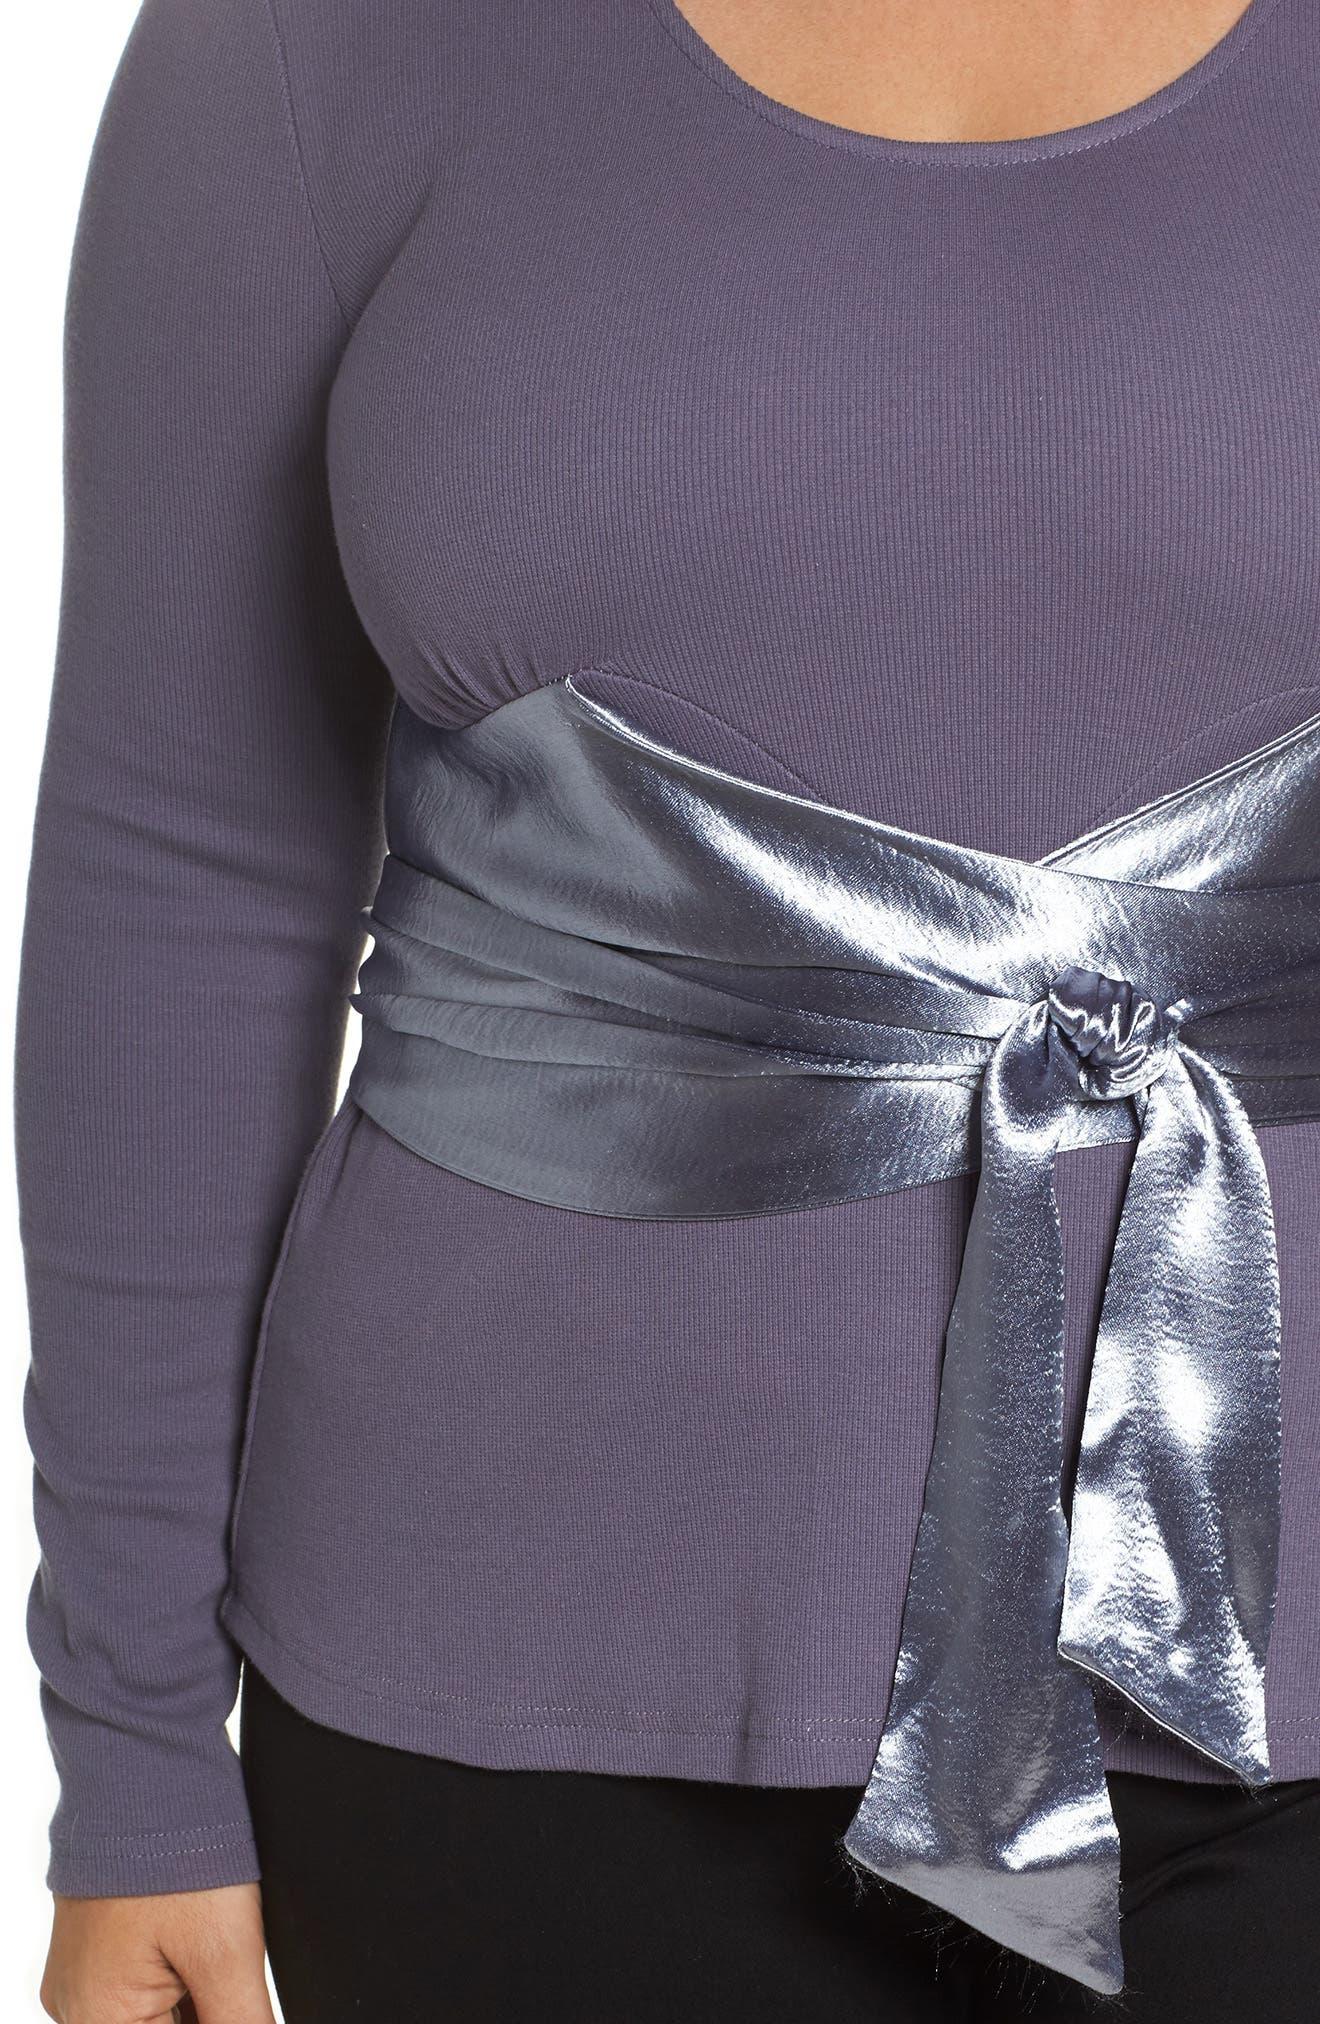 Satin Sash Knit Top,                             Alternate thumbnail 4, color,                             Grey